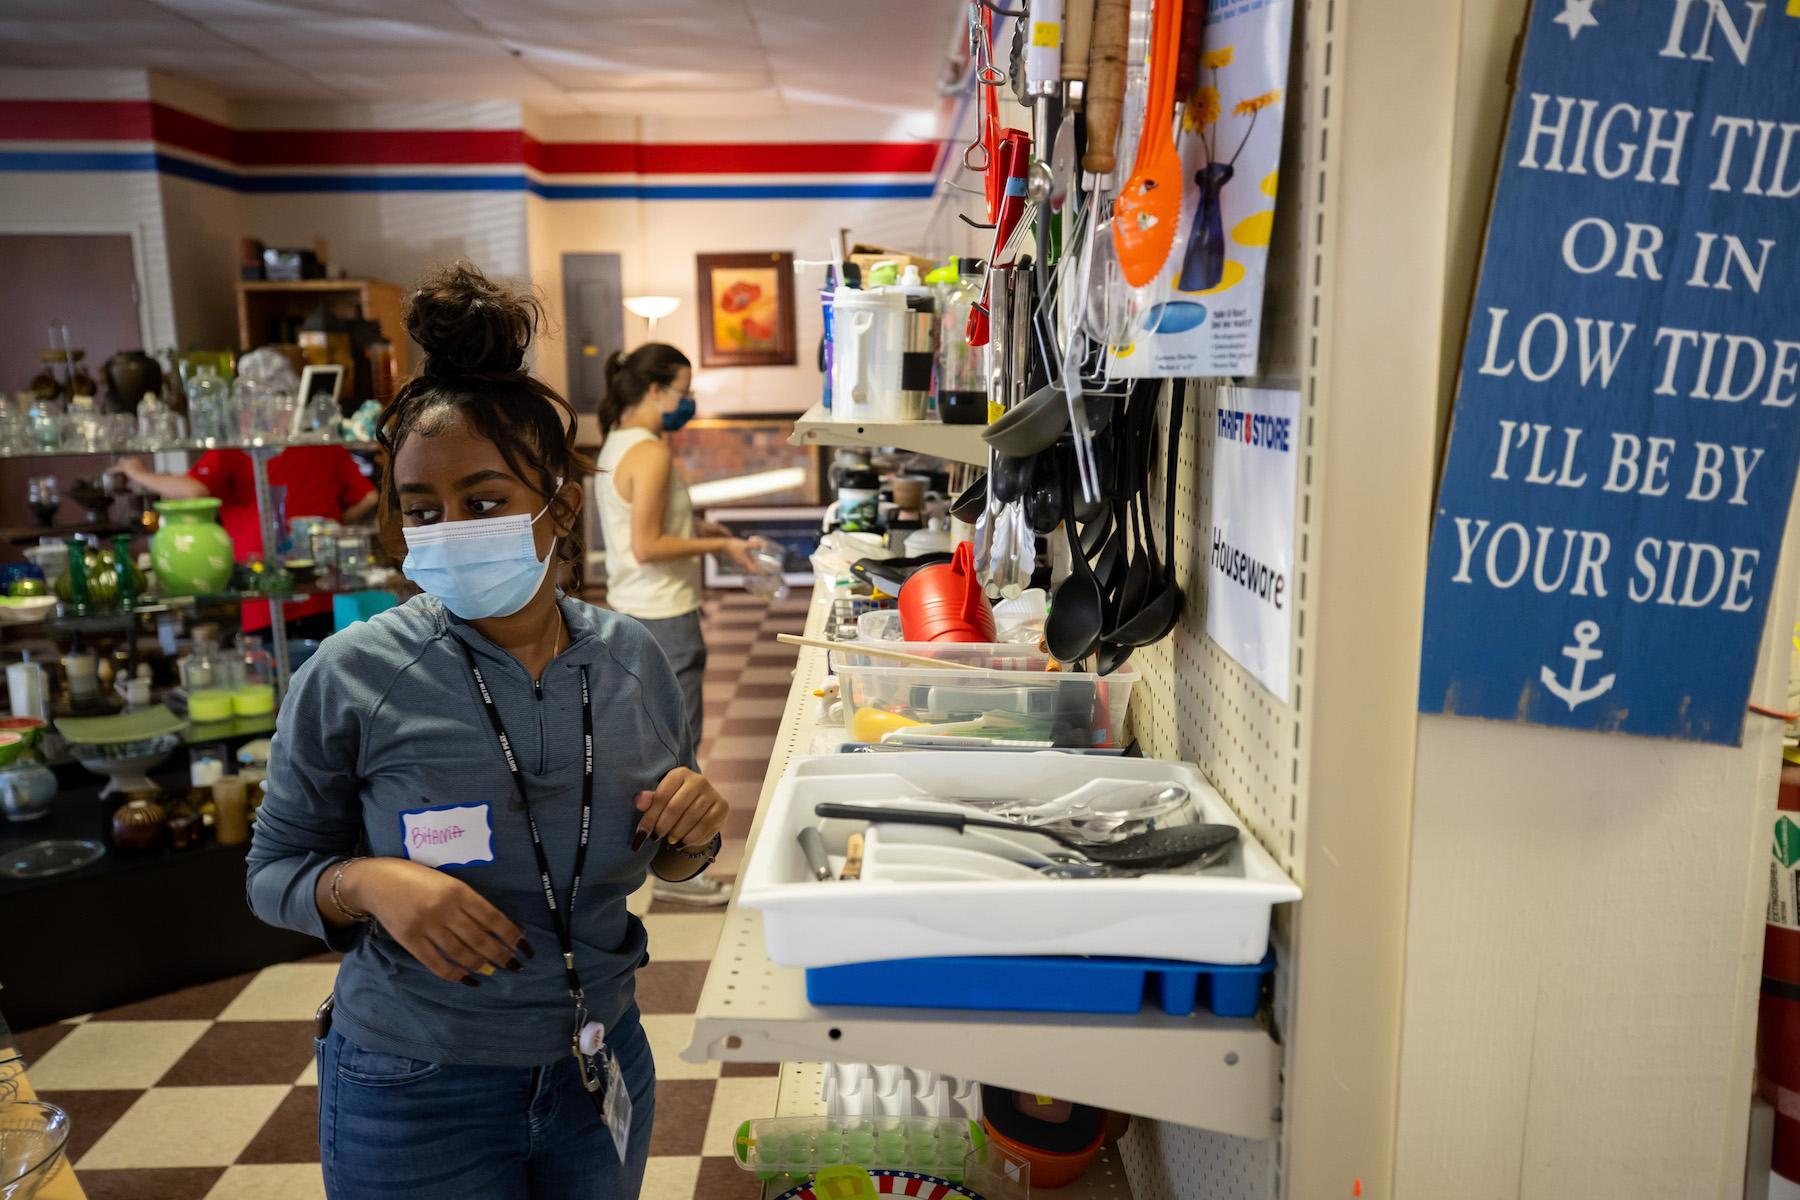 Austin Peay's freshmen serve nonprofits in Clarksville, Hopkinsville, Dickson during Freshman Service Project